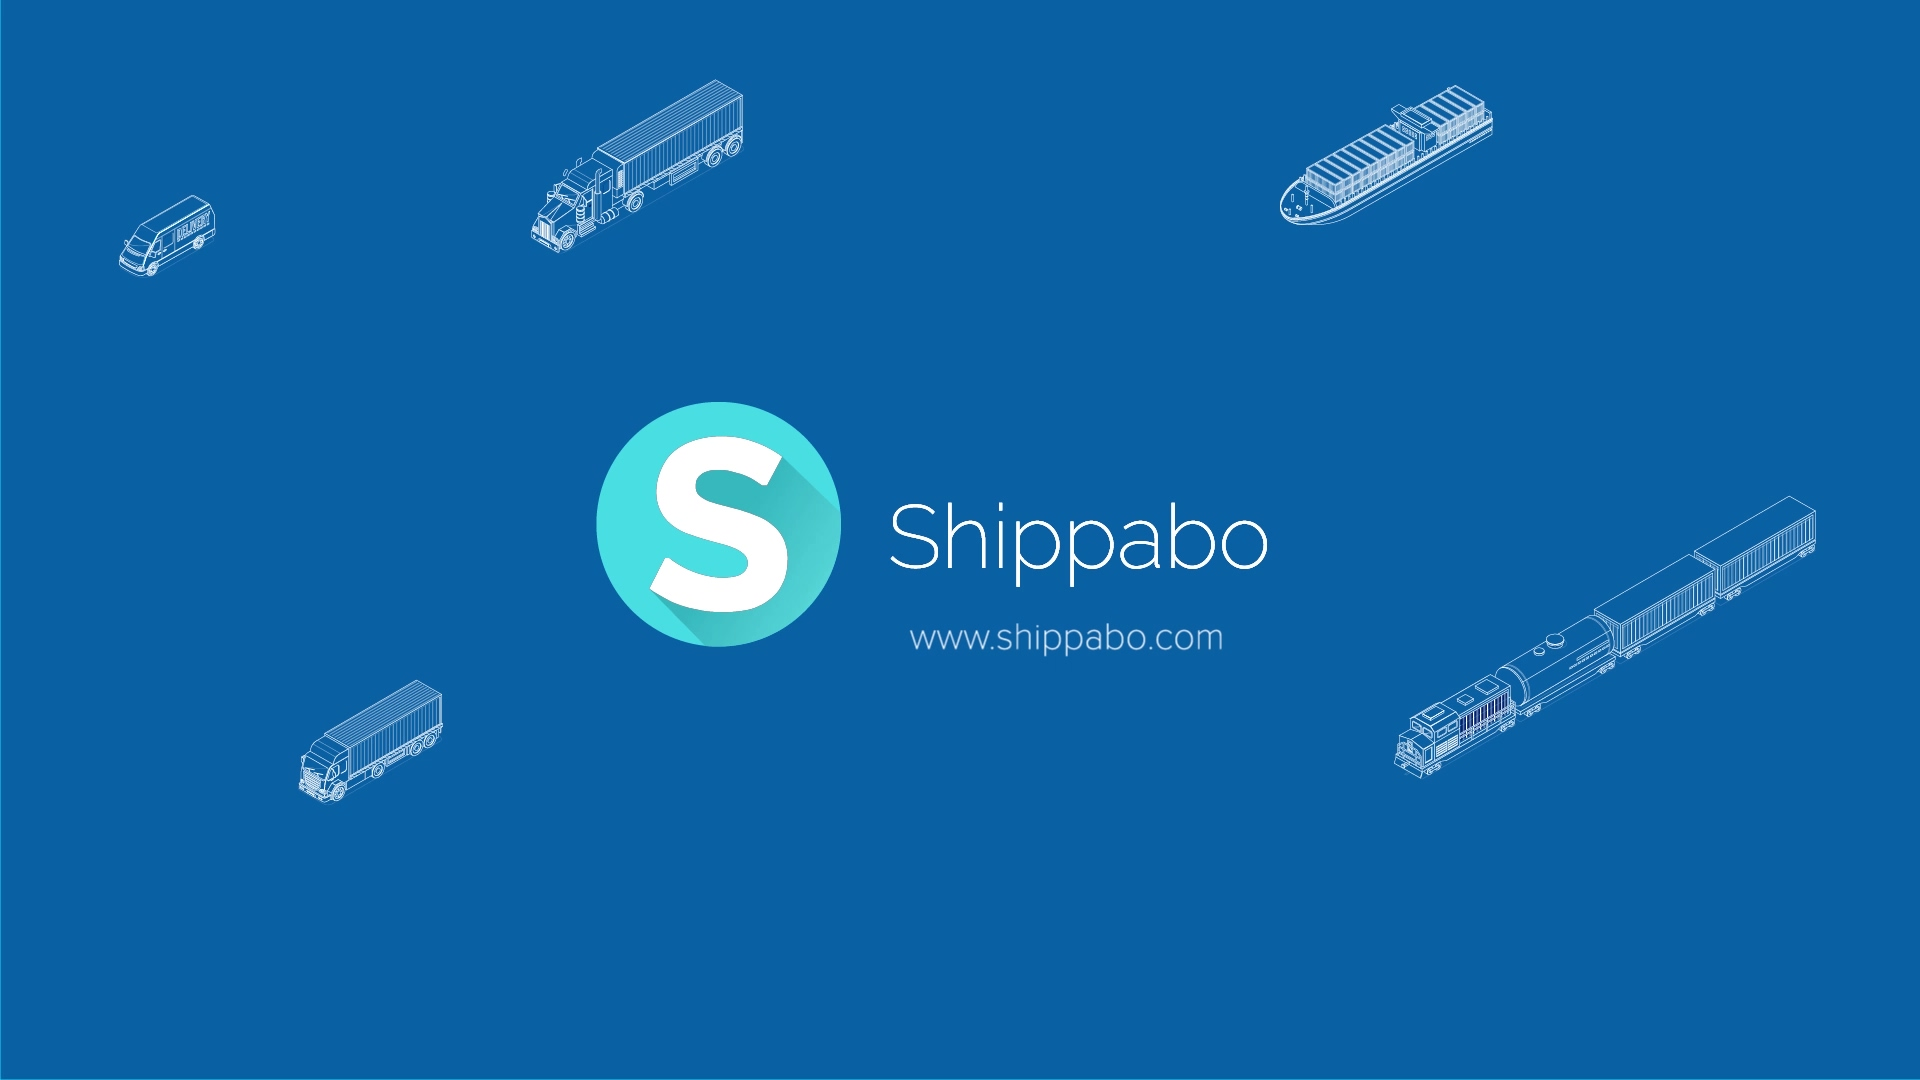 Shippabo-0821-Explainer_Final Cut-1